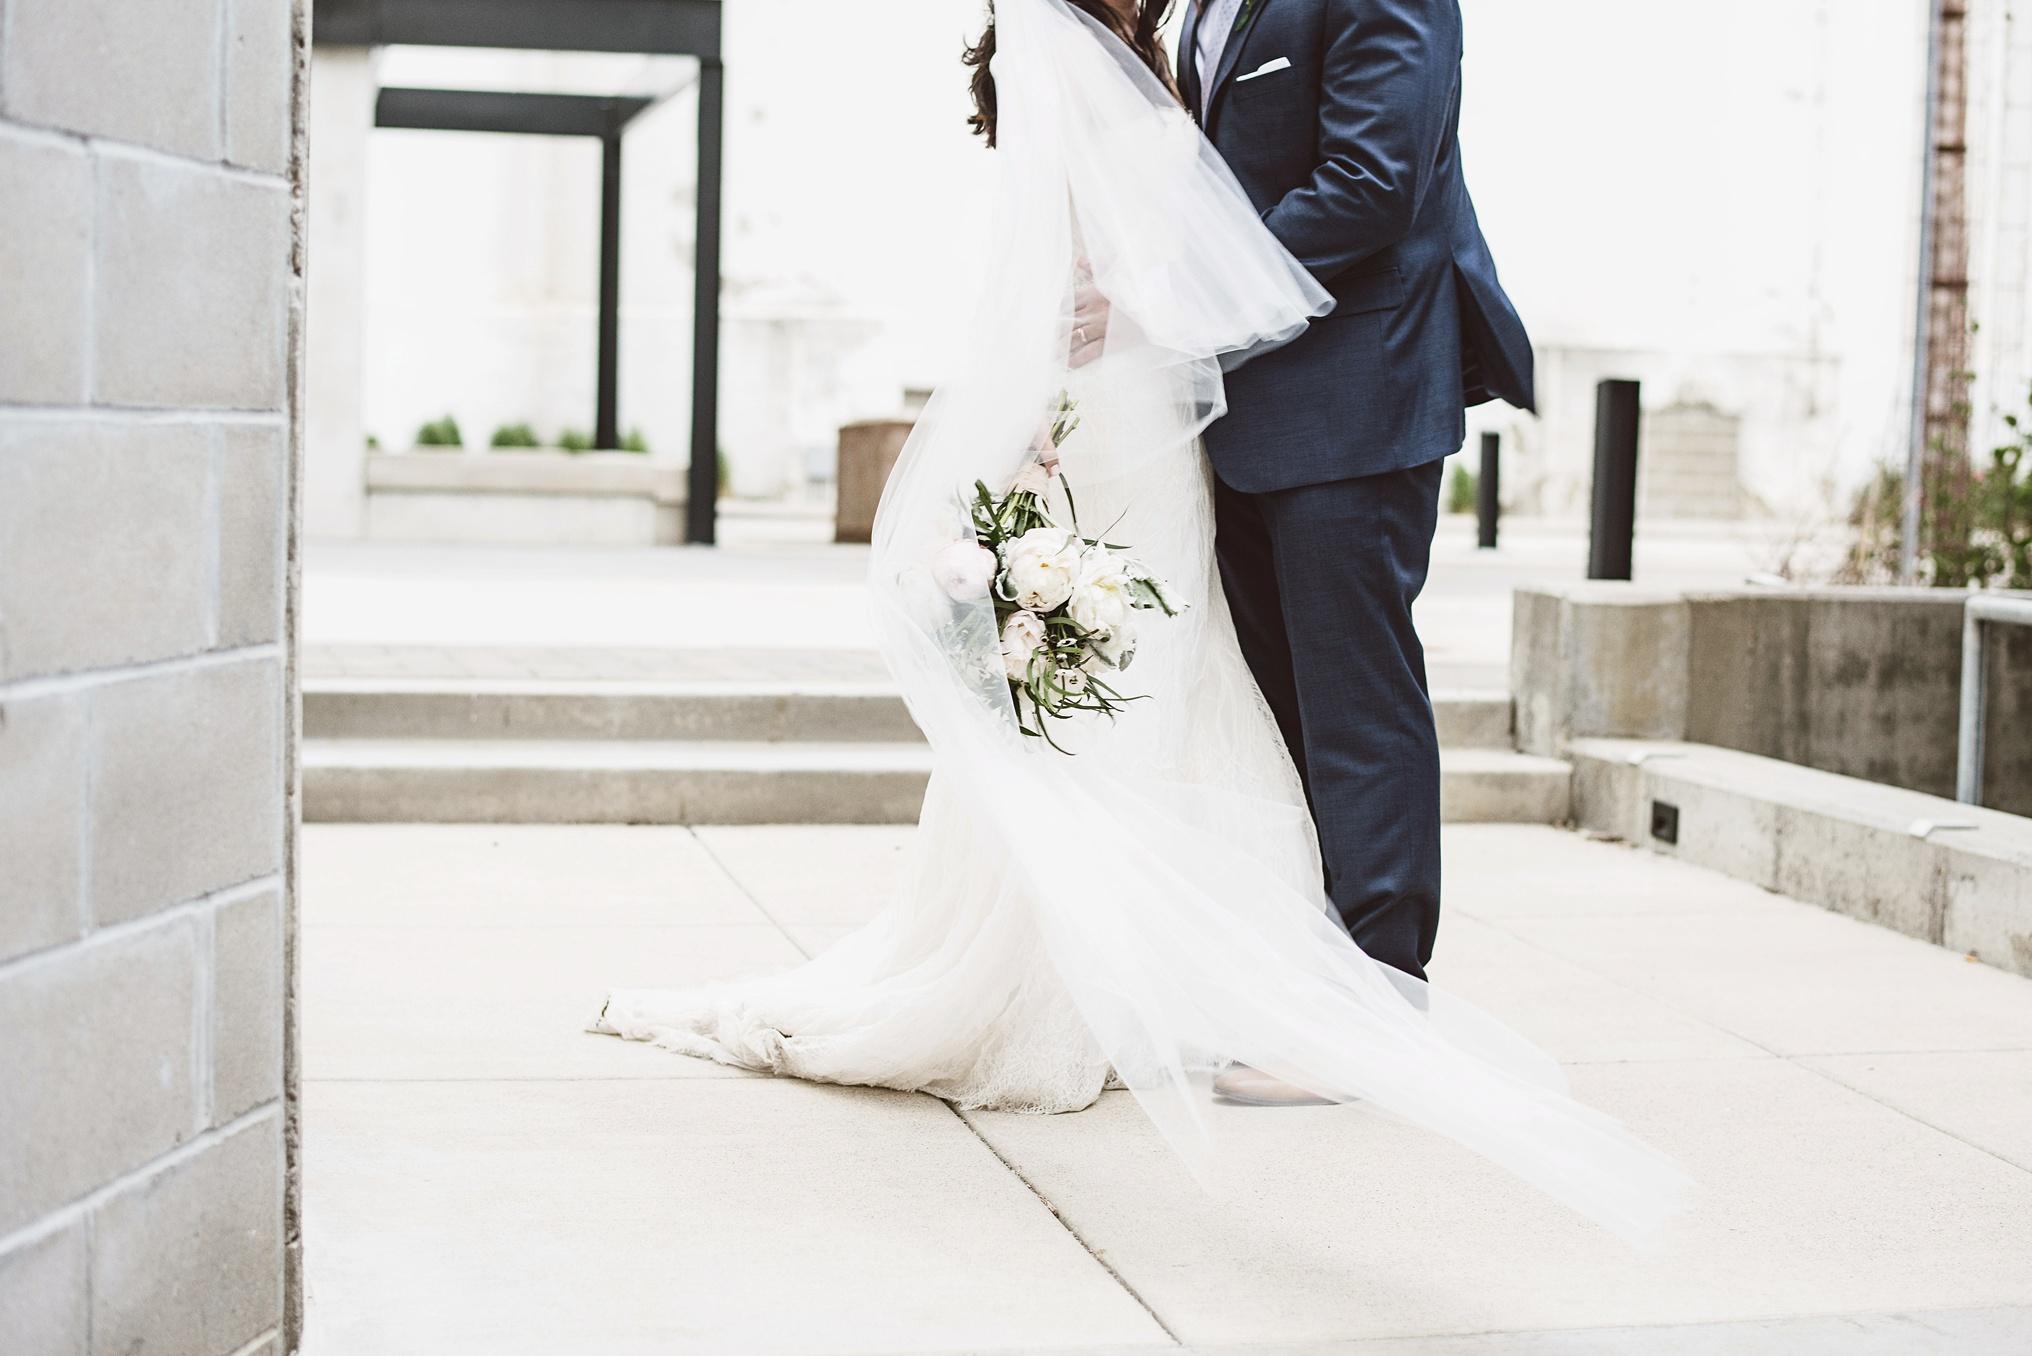 best_wedding_photography_2017_by_lucas_botz_photography_203.jpg